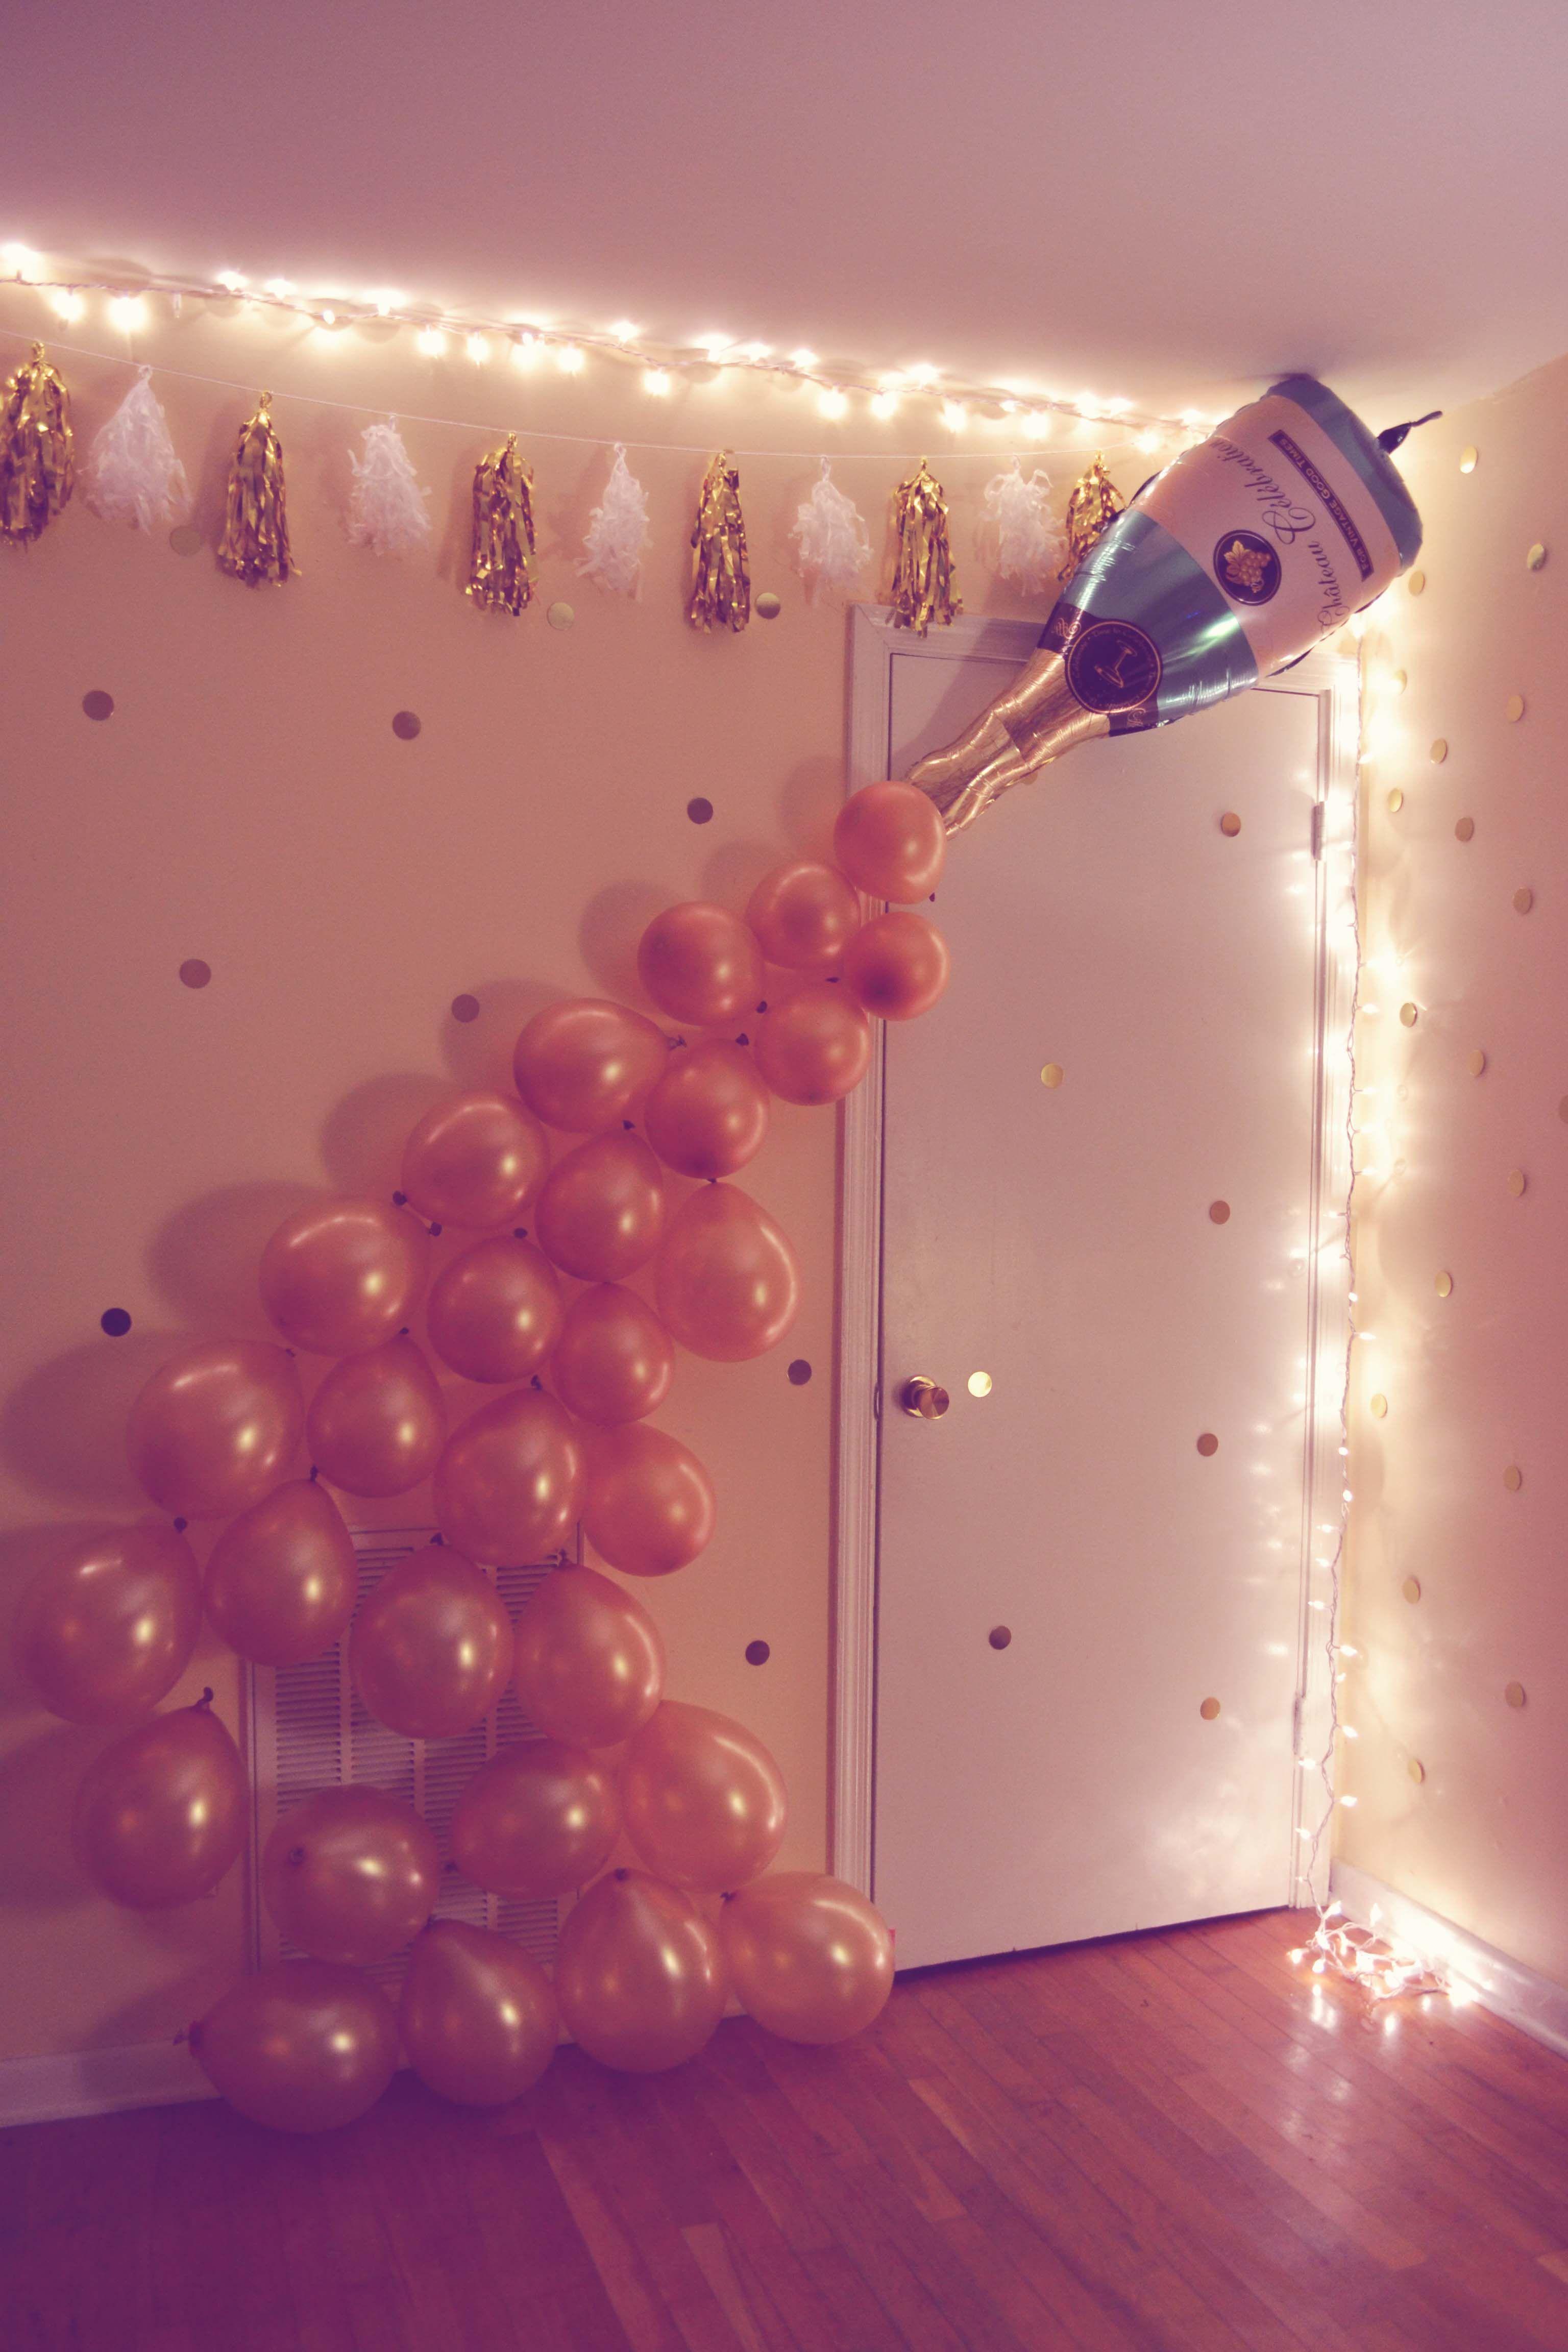 Diy st birthday party also ideas pinterest rh co